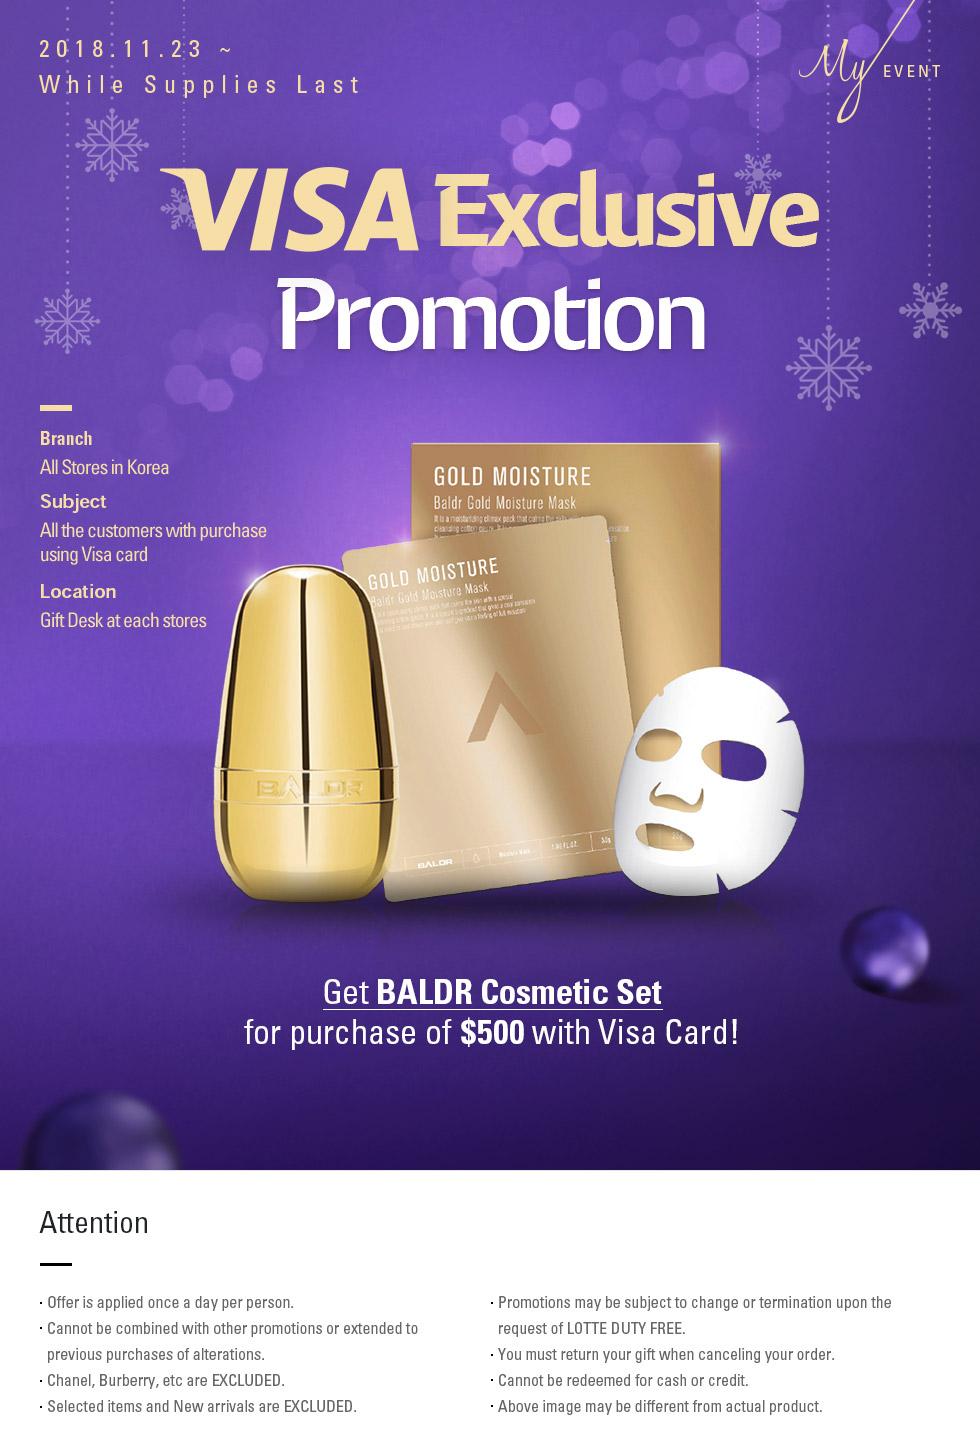 VISA Exclusive Promotion